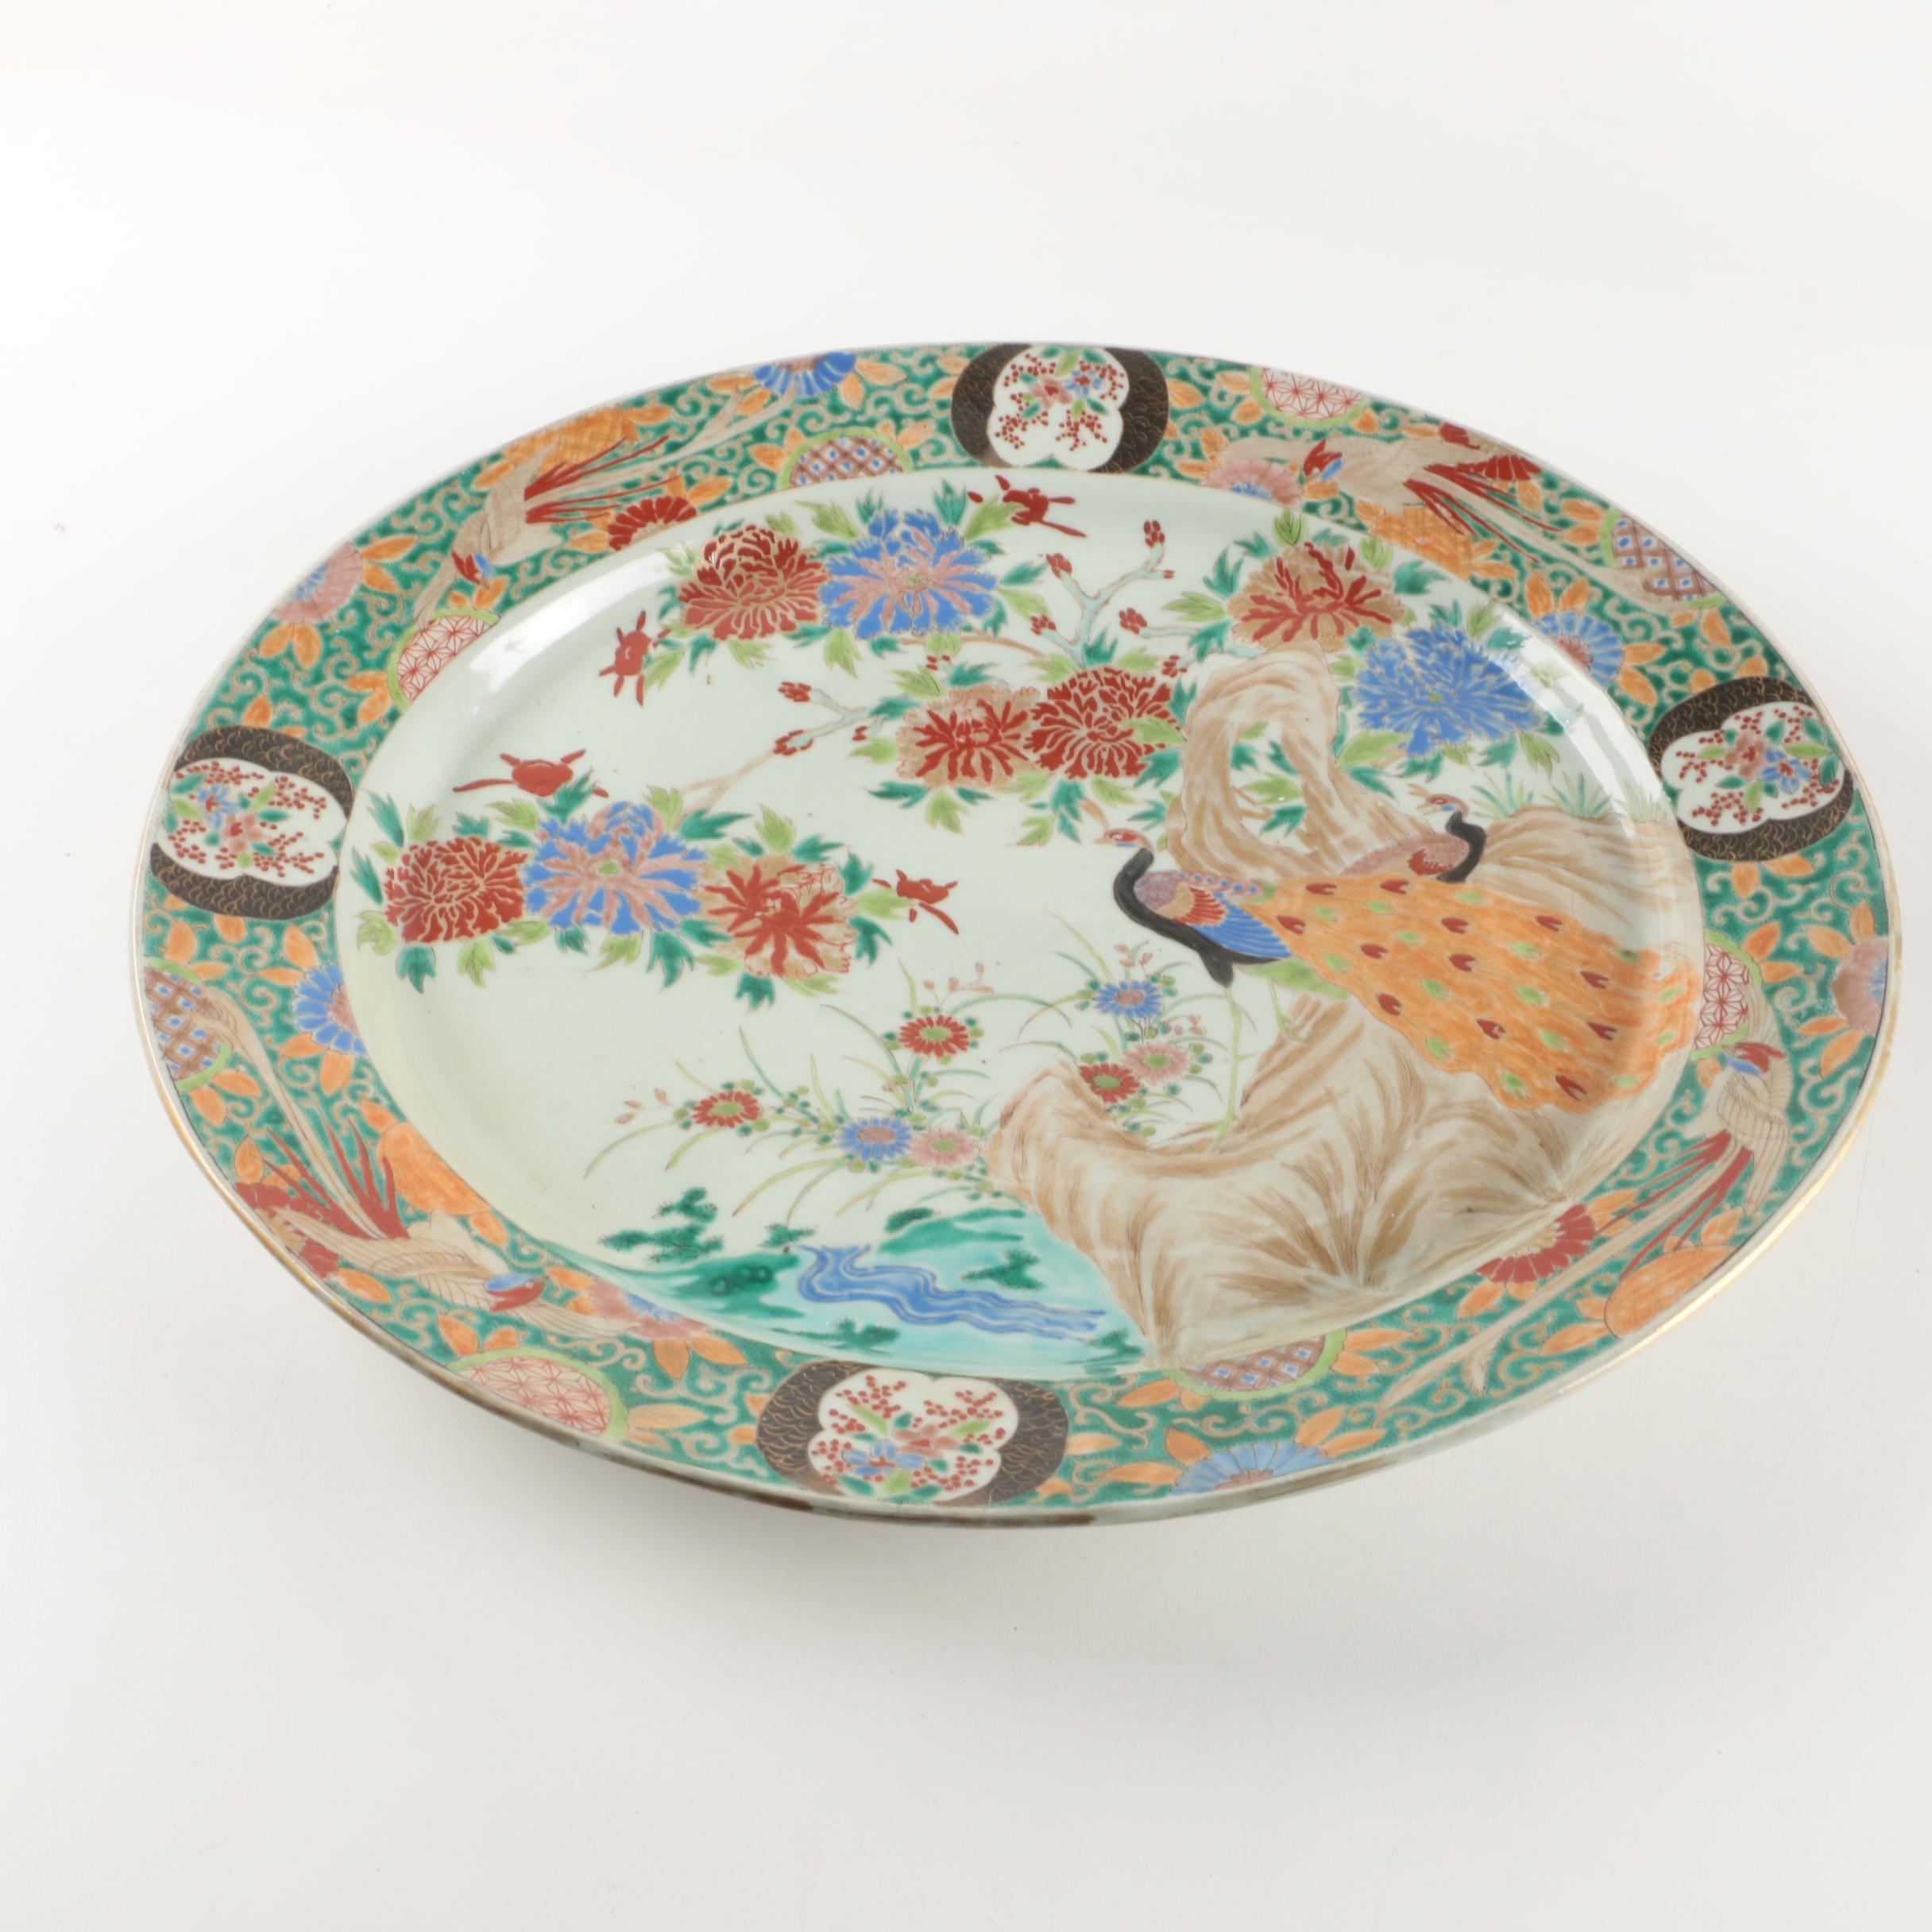 Japanese Hand-Painted Ceramic Platter